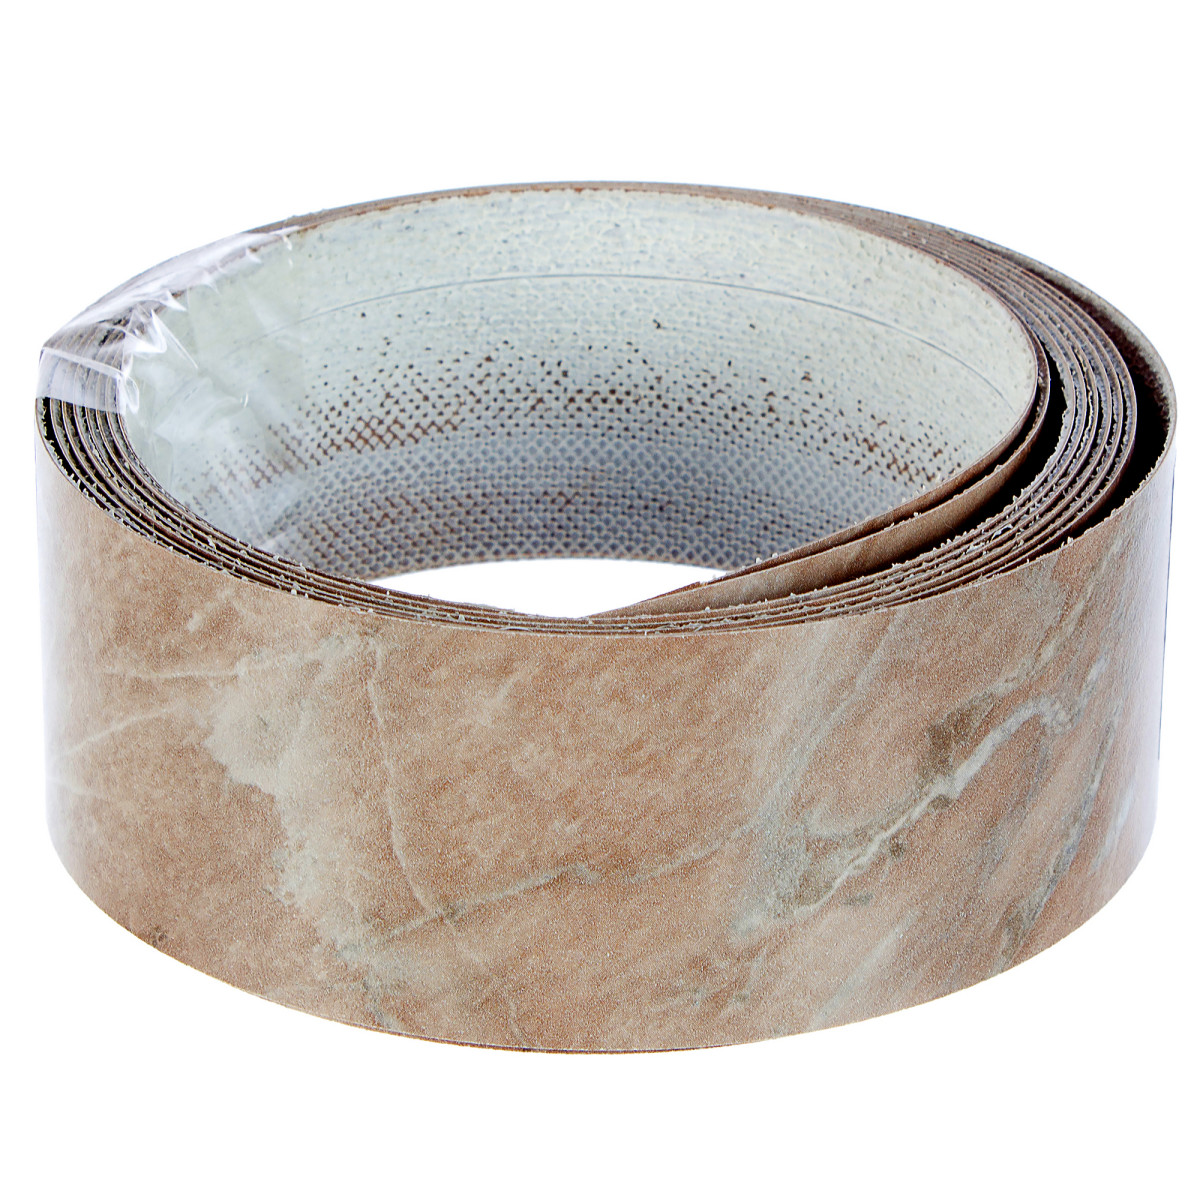 Кромка №3020 с клеем для столешницы 300х4.5 см цвет мрамор